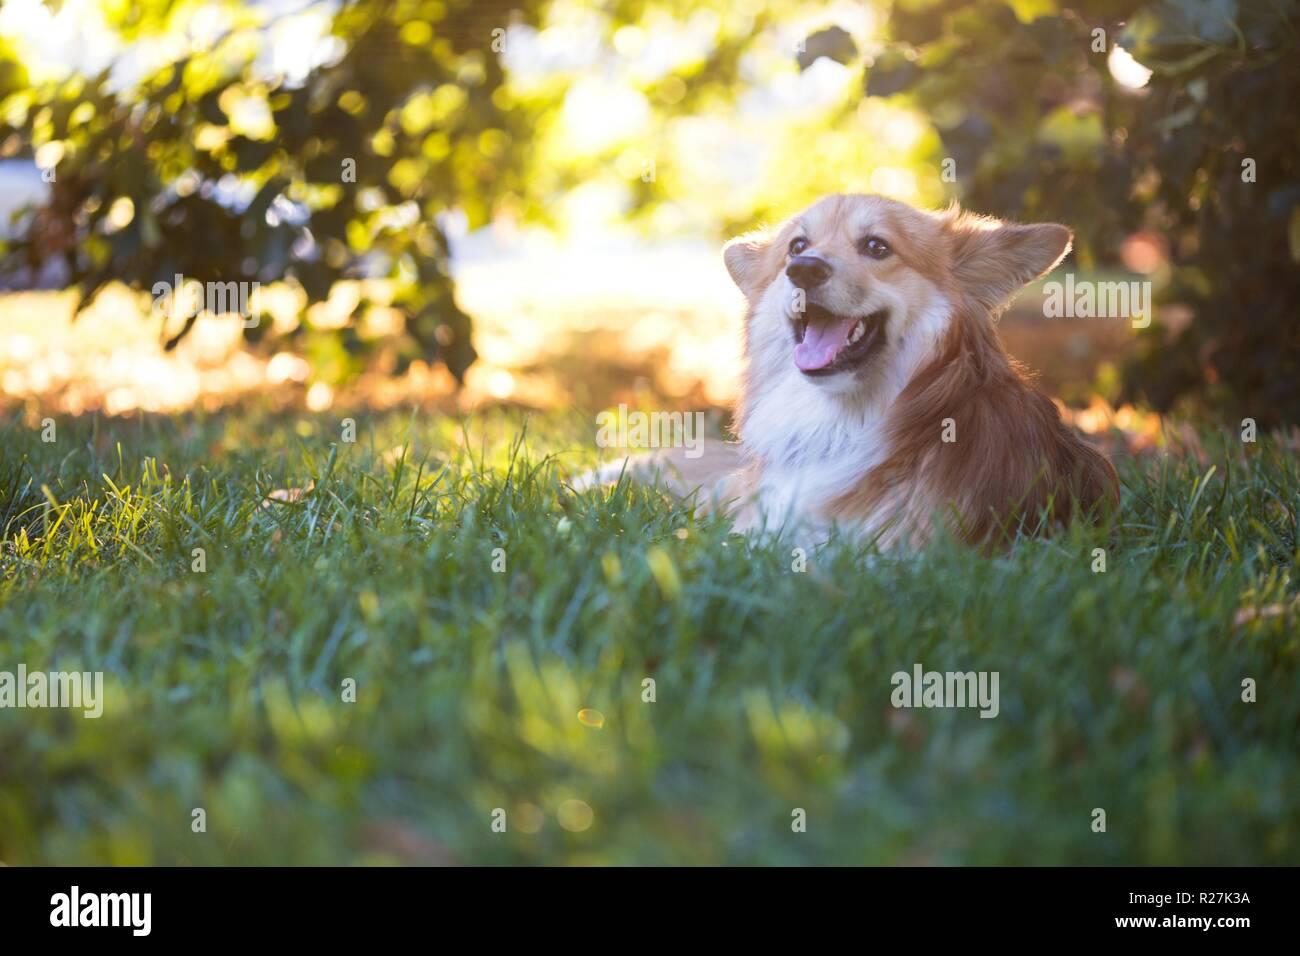 beautiful corgi fluffy close up portrait at the outdoor. autumn - Stock Image